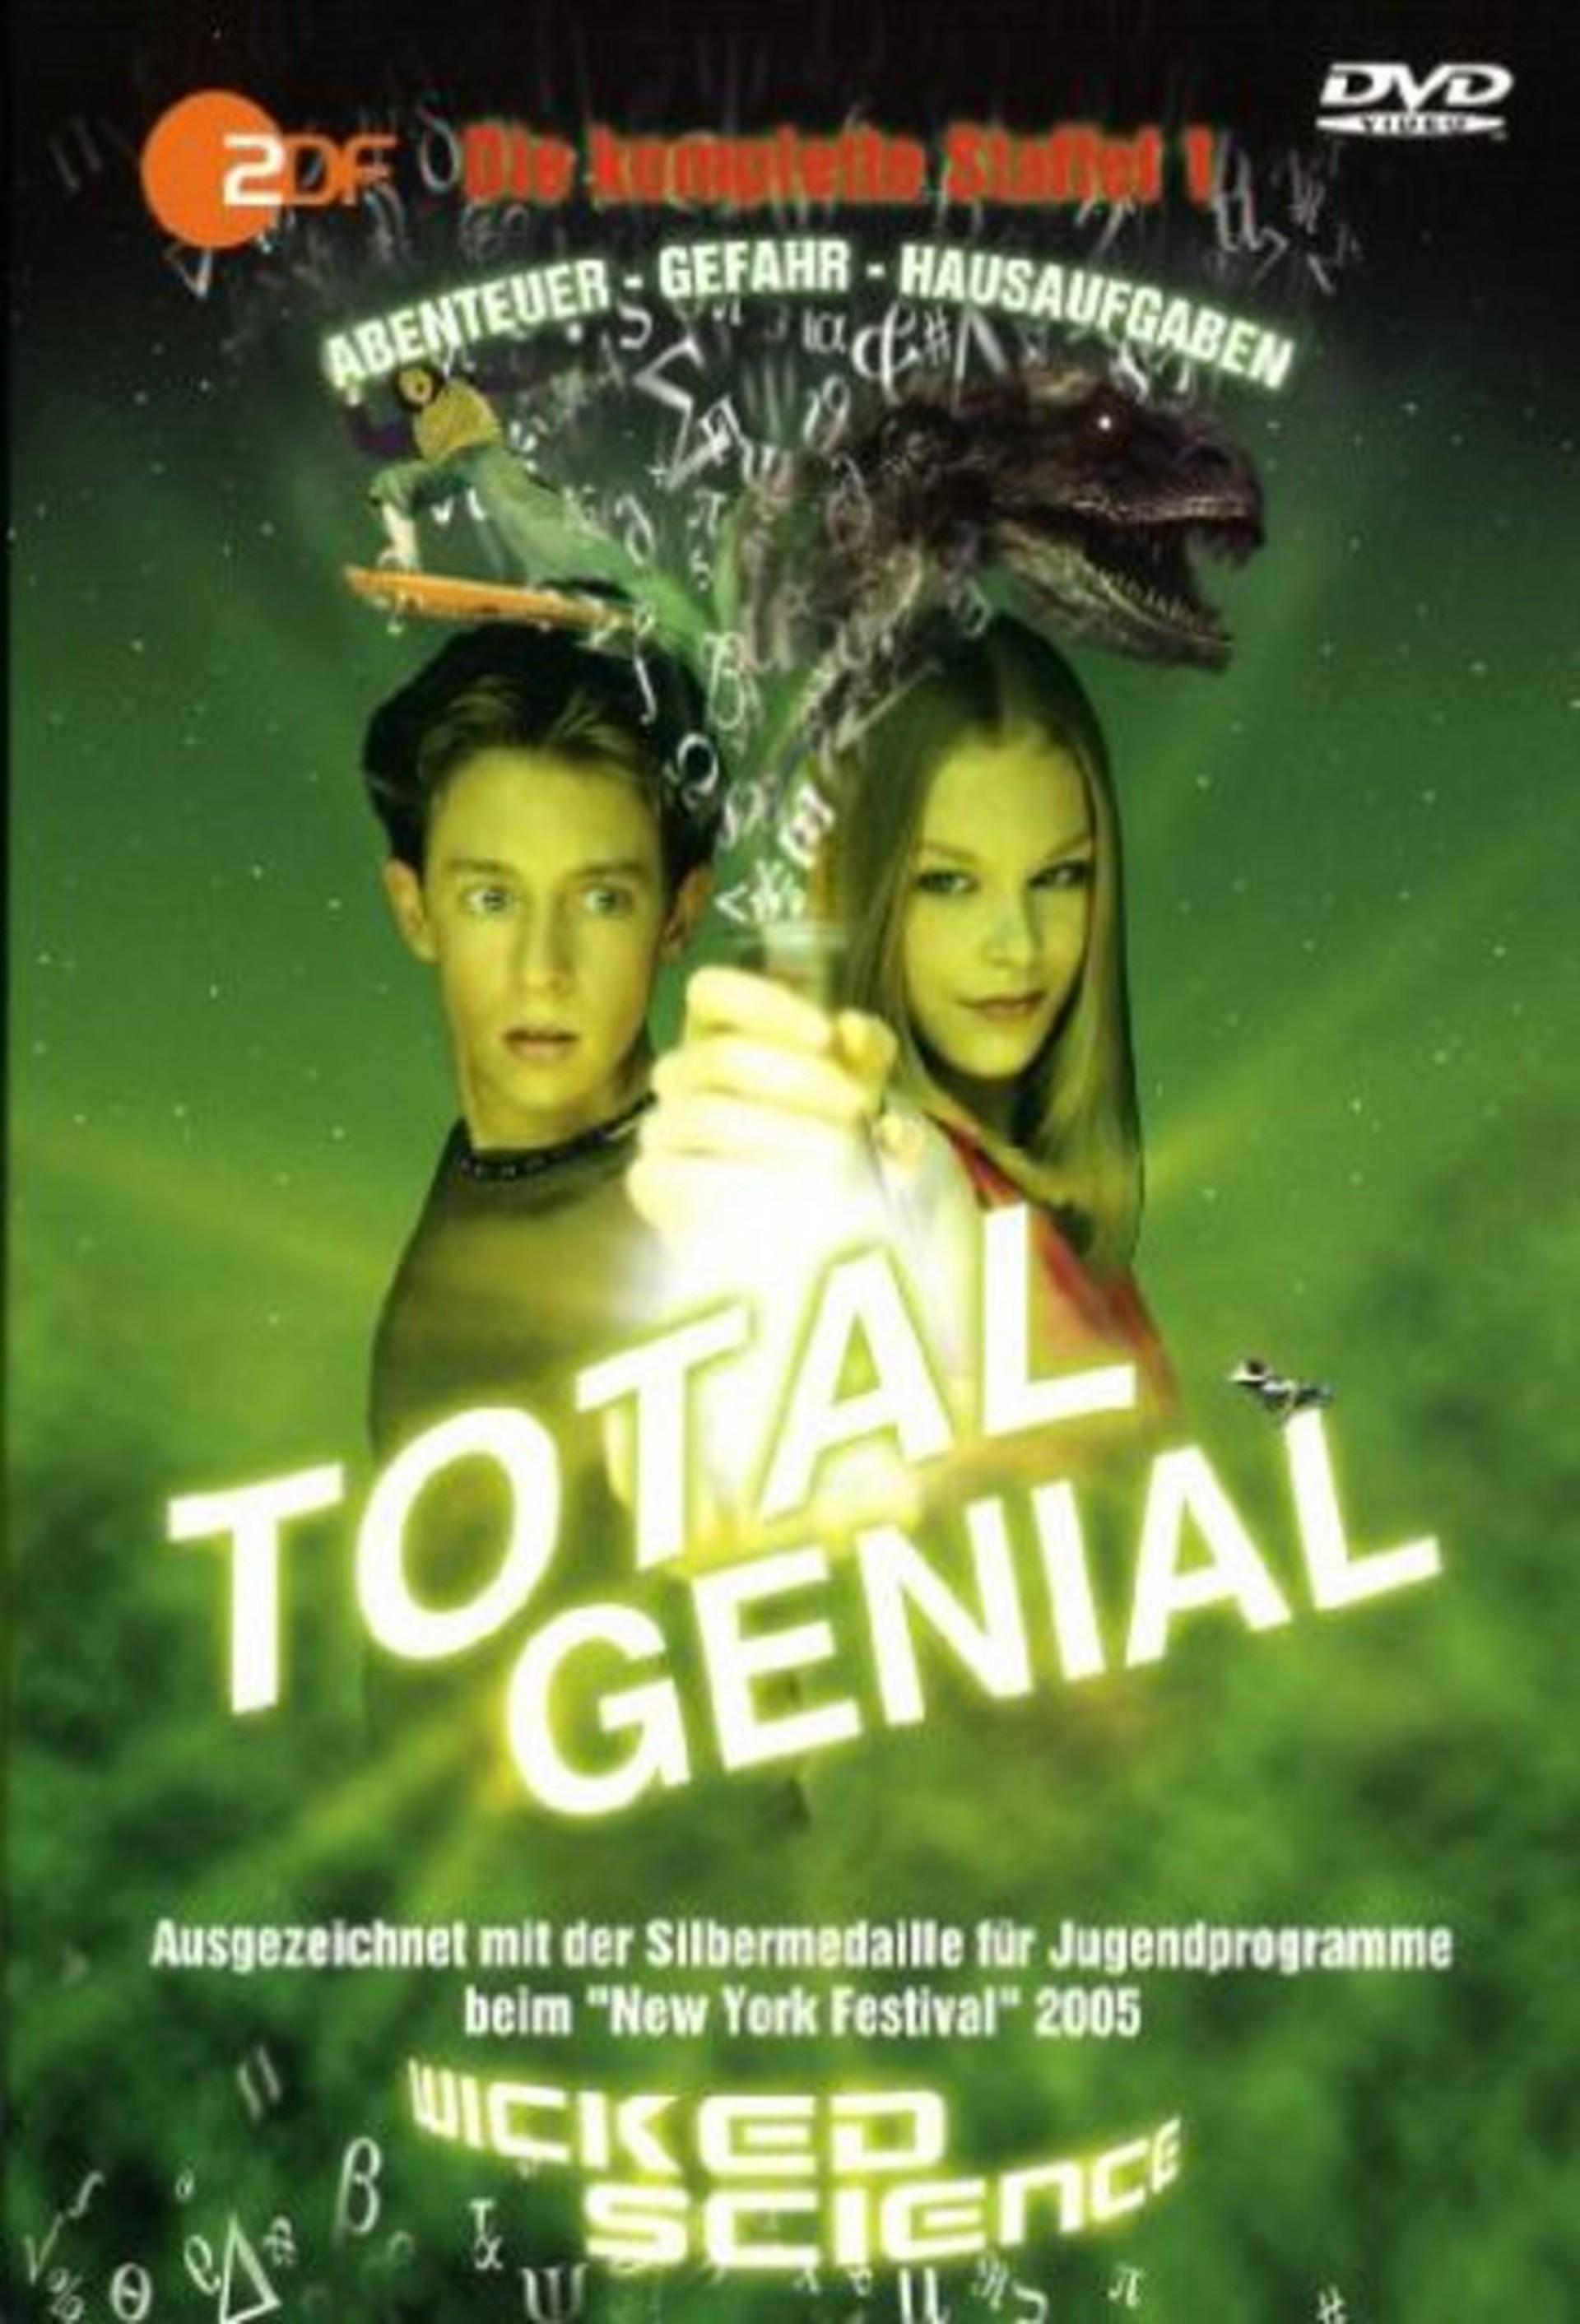 Wicked Science: Season 2